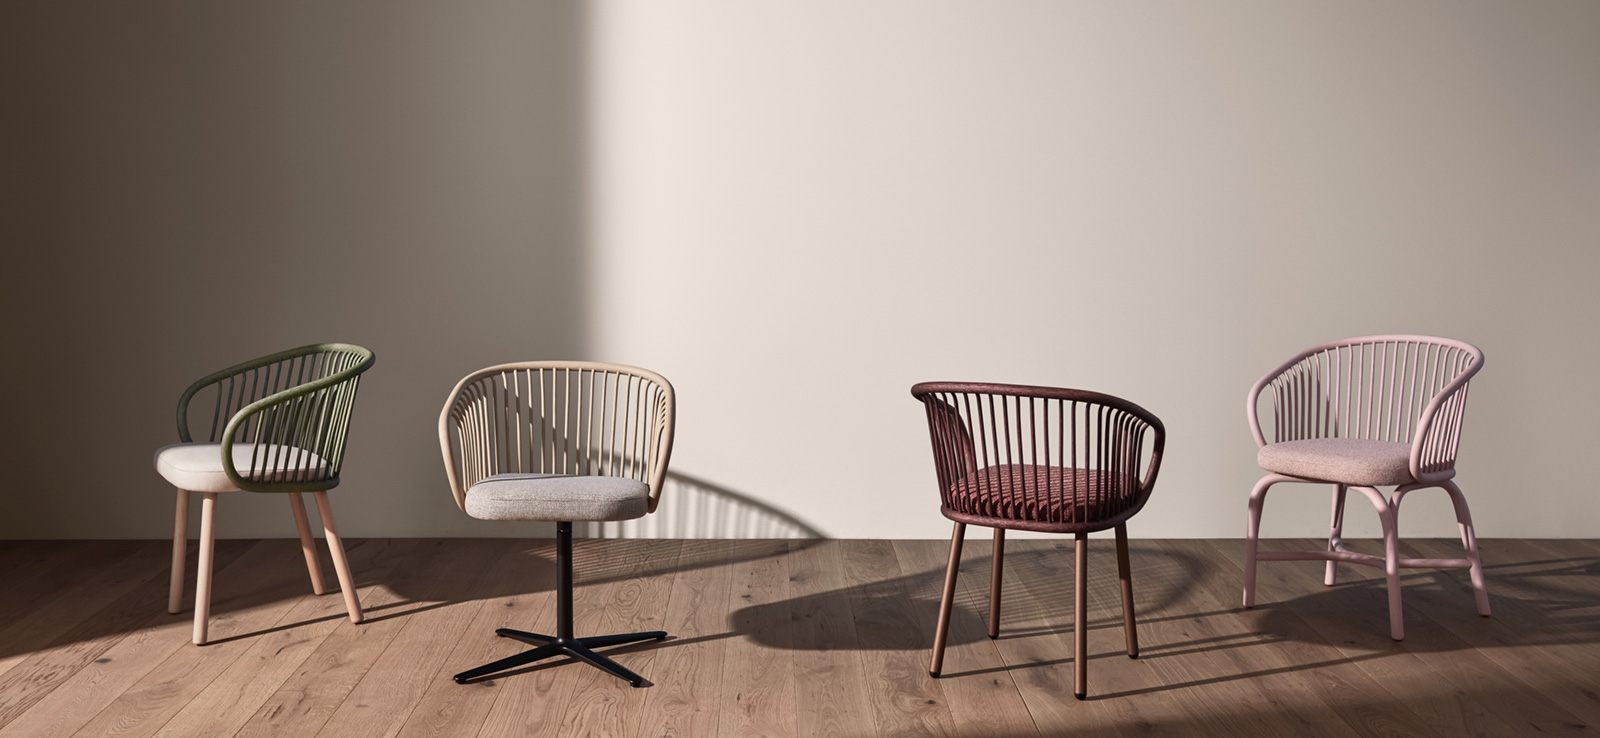 TinnappleMetz-Expormim-huma-armchair-06